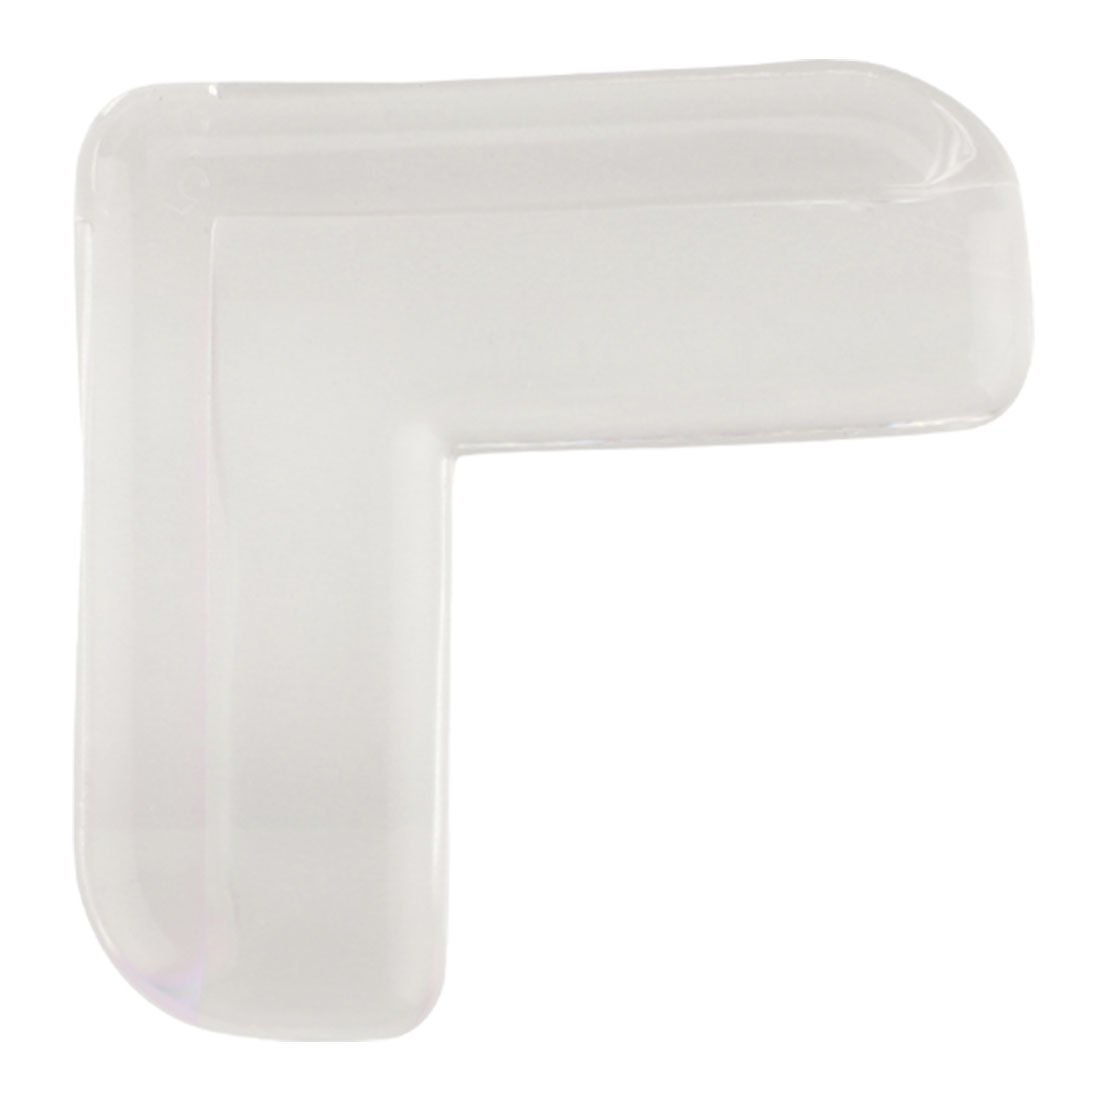 Desk Table Edge PVC Corner Cushion Guard Strip Roll Bumper Protector, Clear